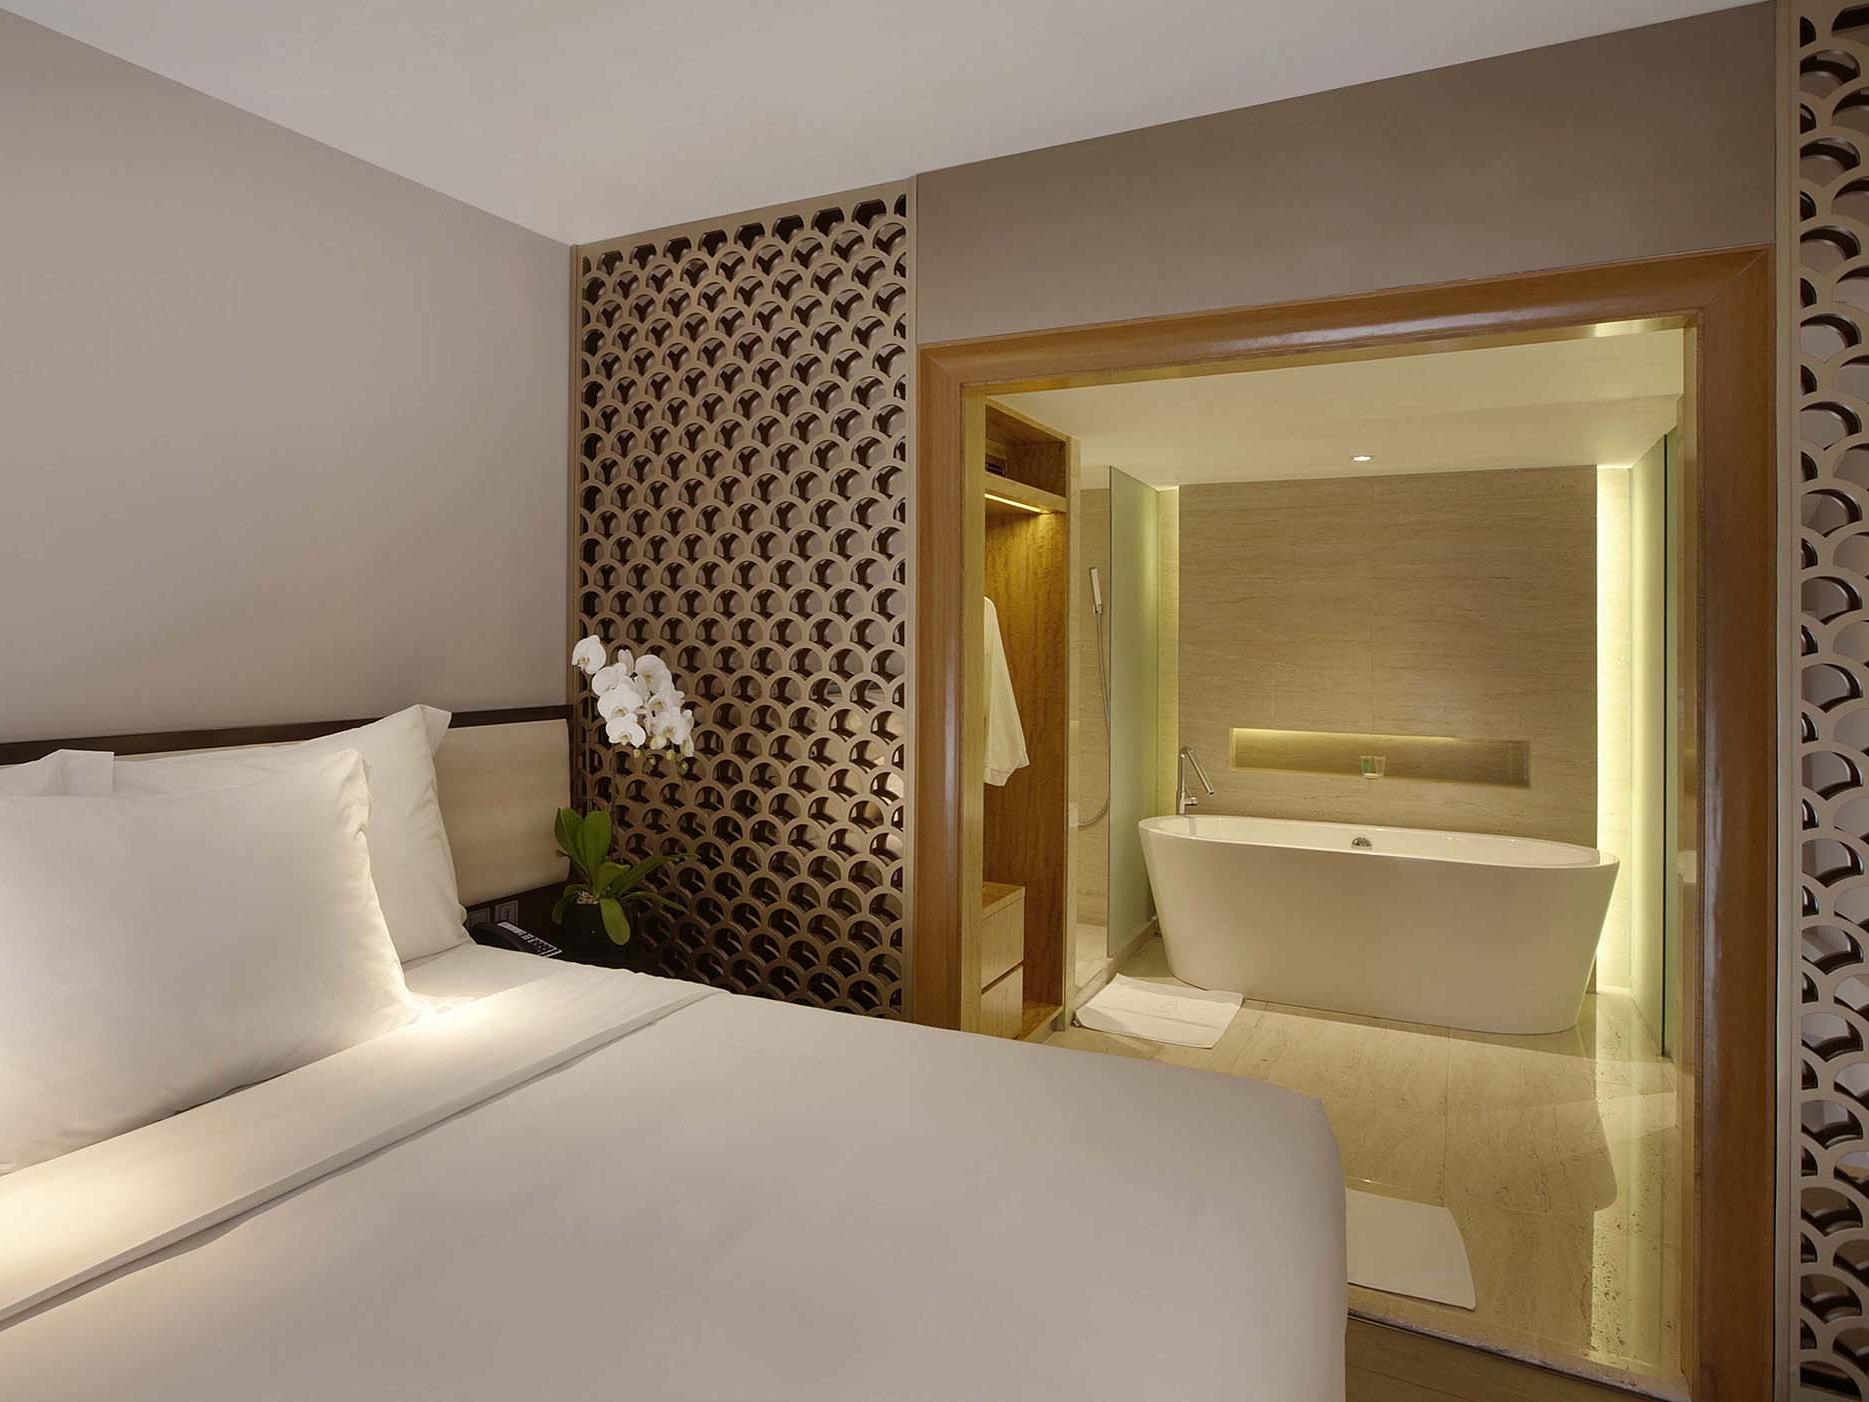 Mahakam Executive Suite at Hotel Gran Mahakam in Jakarta, Indonesia